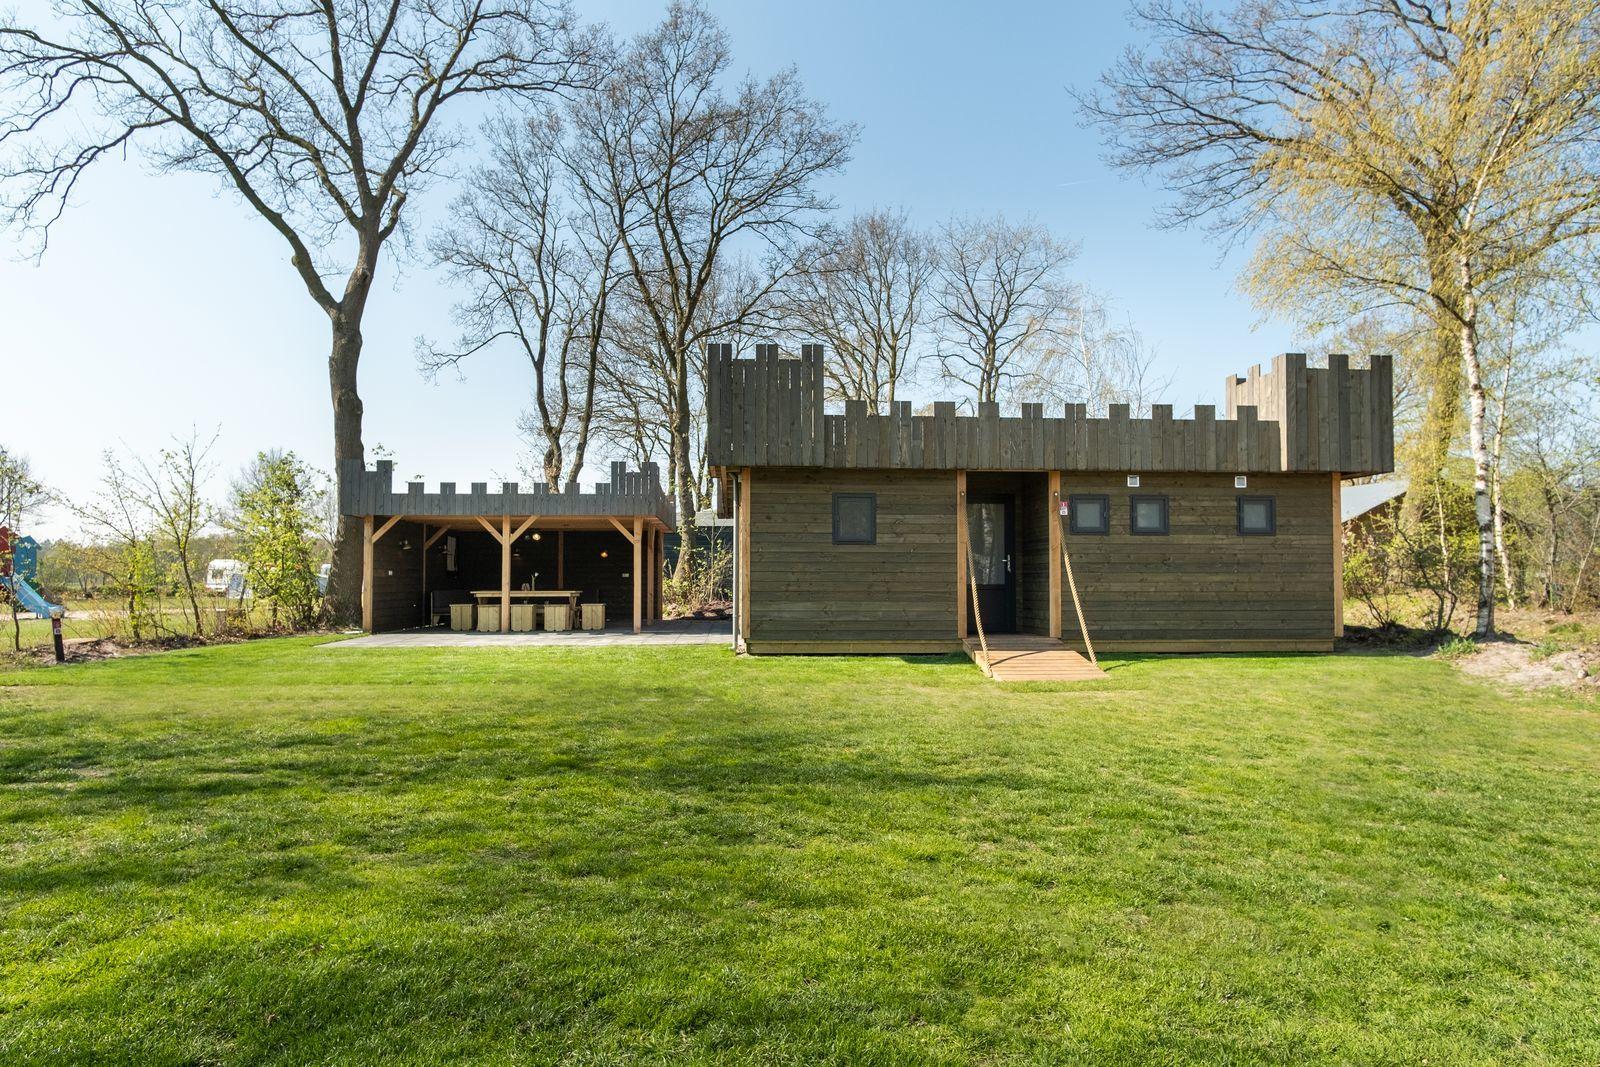 Castle Uylenburght